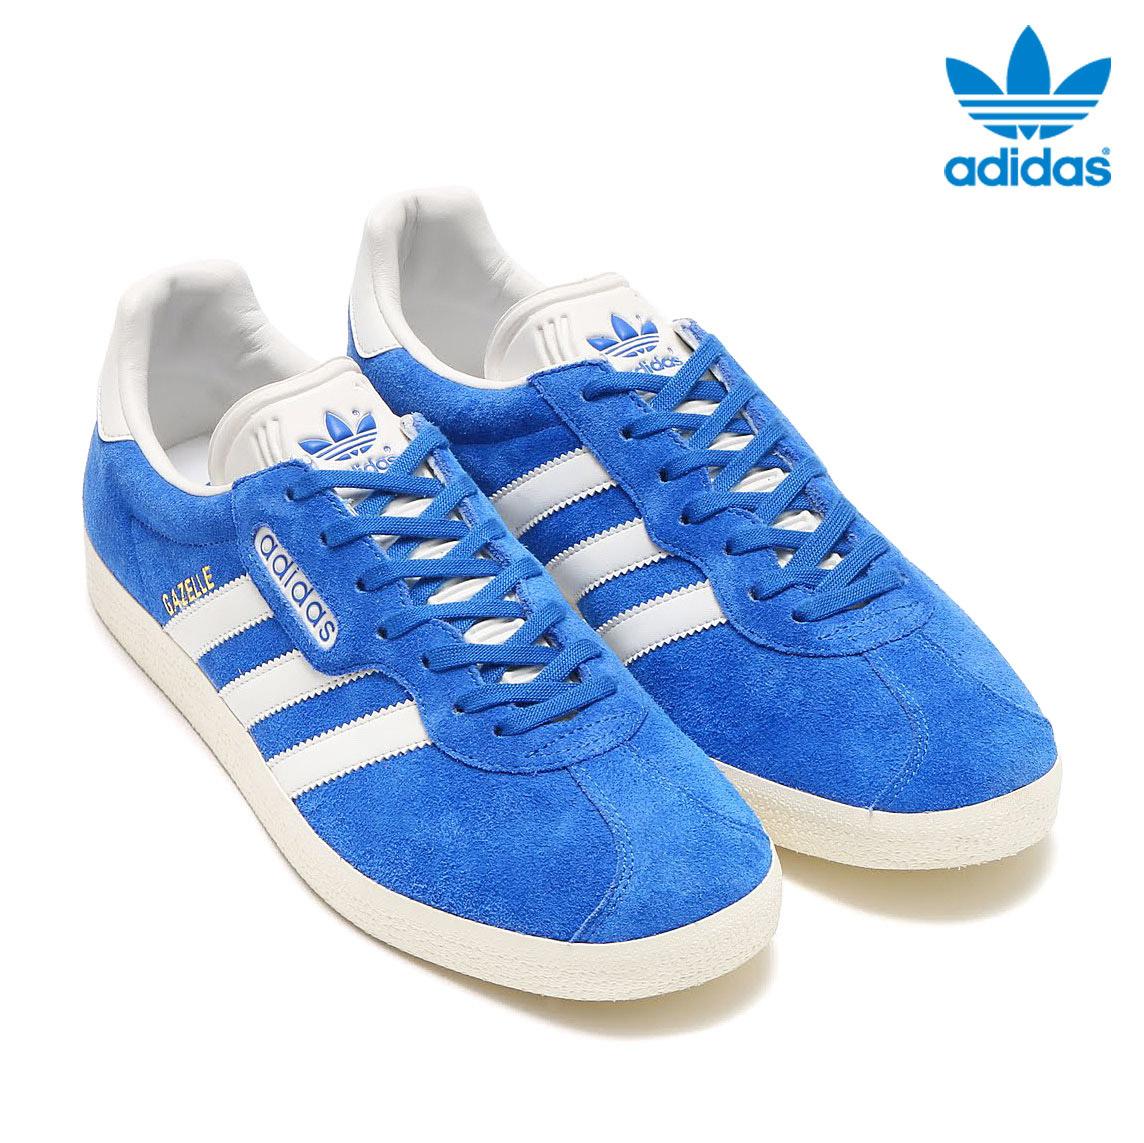 adidas Originals GAZELLE SP (アディダス オリジナルス ガゼル) (Blue/Vintage White/Gold Mett) 【メンズ レディース スニーカー】17SS-I